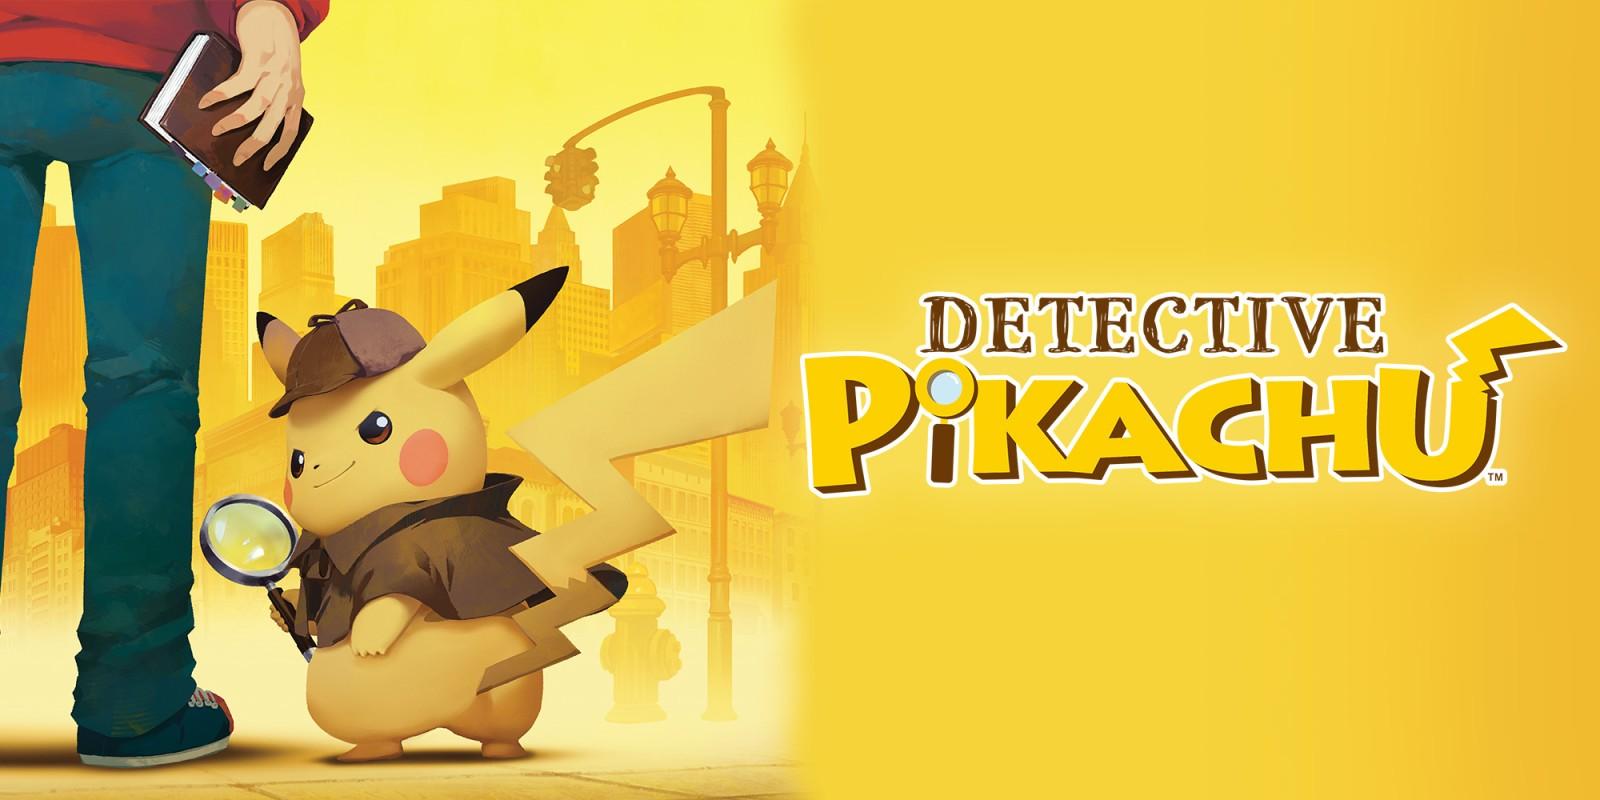 Пикачу (персонаж) - картинки, биография, характеристика, эволюция, способности, покемоны - 24сми